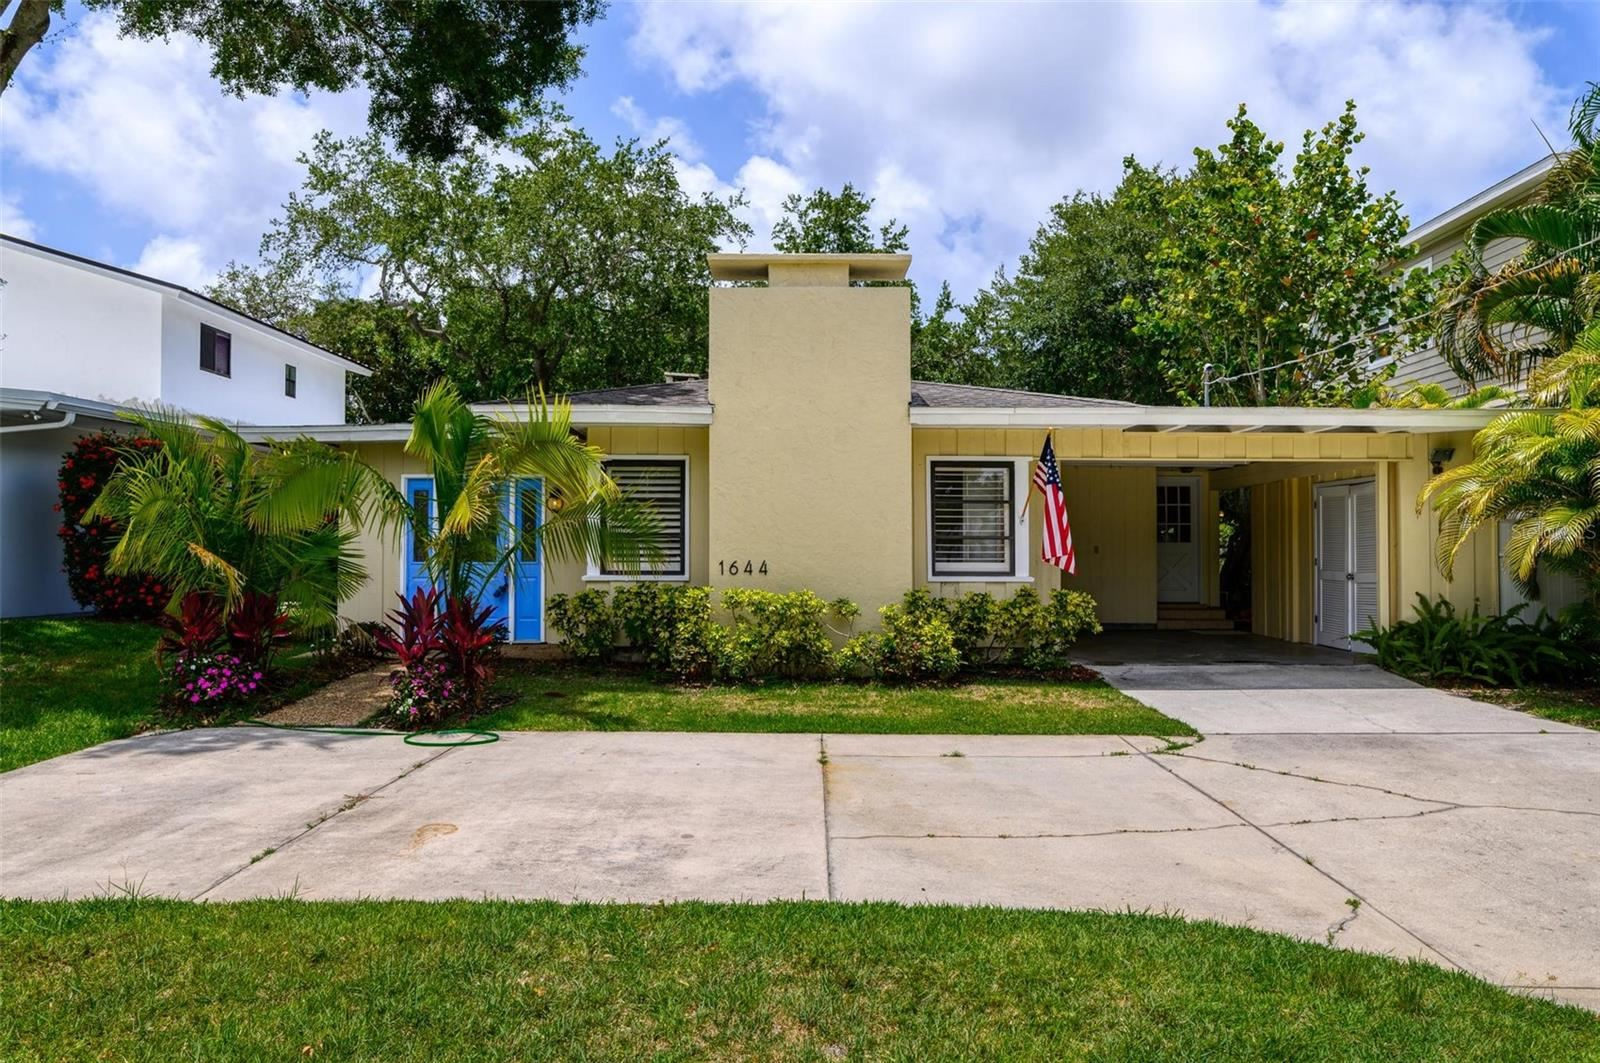 1644 BLUE HERON DRIVE, Sarasota, FL 34239 - #: A4511310